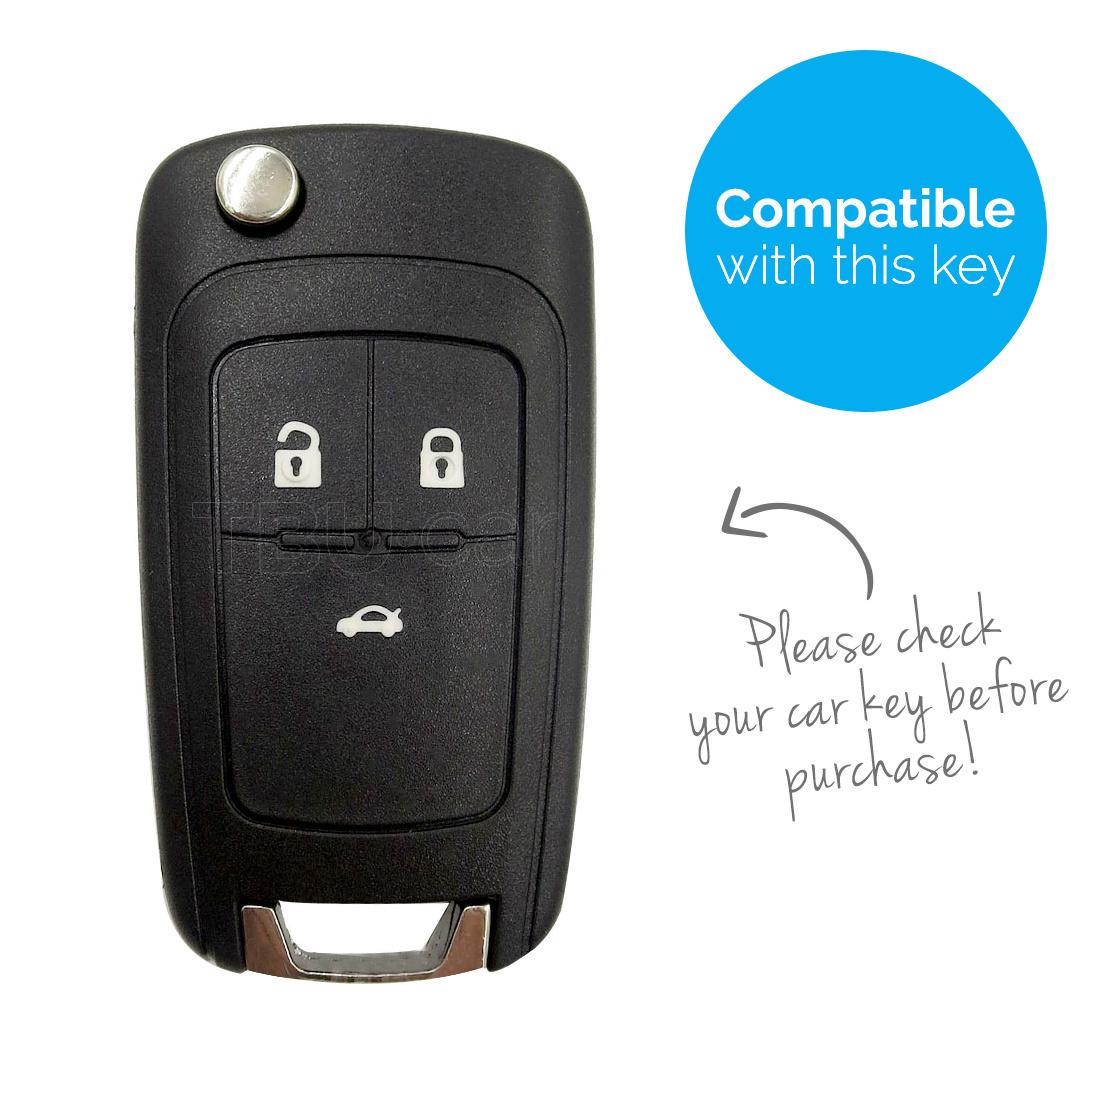 TBU car TBU car Autoschlüssel Hülle kompatibel mit Chevrolet 3 Tasten - Schutzhülle aus Silikon - Auto Schlüsselhülle Cover in Violett